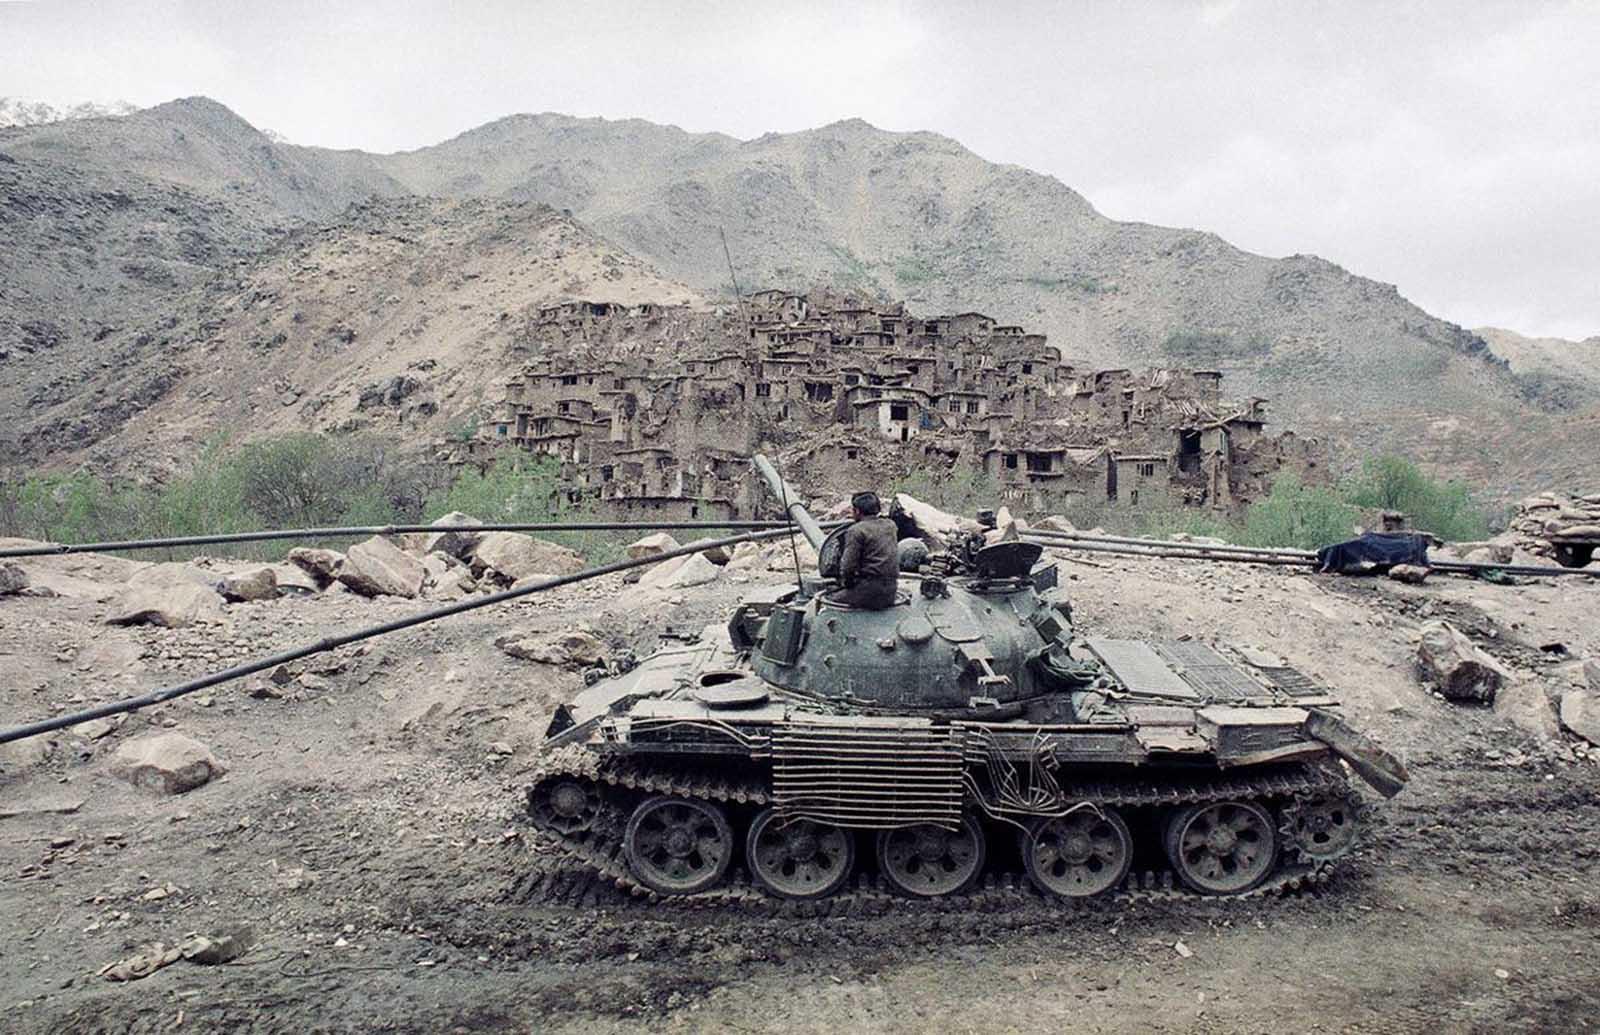 les blindés Soviet_war_in_afghanistan_in_pictures-23-jpg